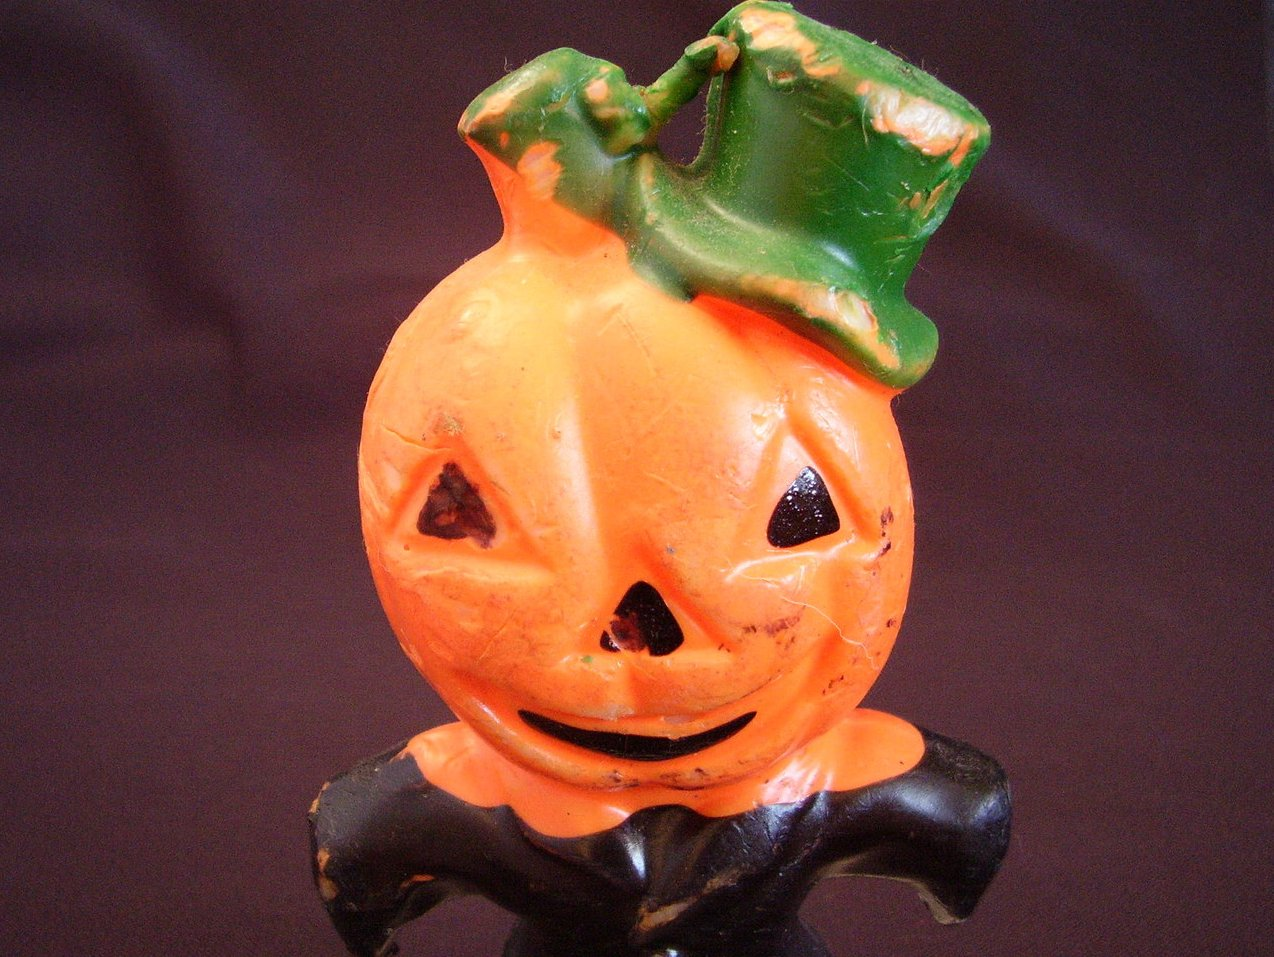 Gurley Jack O' Lantern Pumpkin Man Halloween Candle Vintage